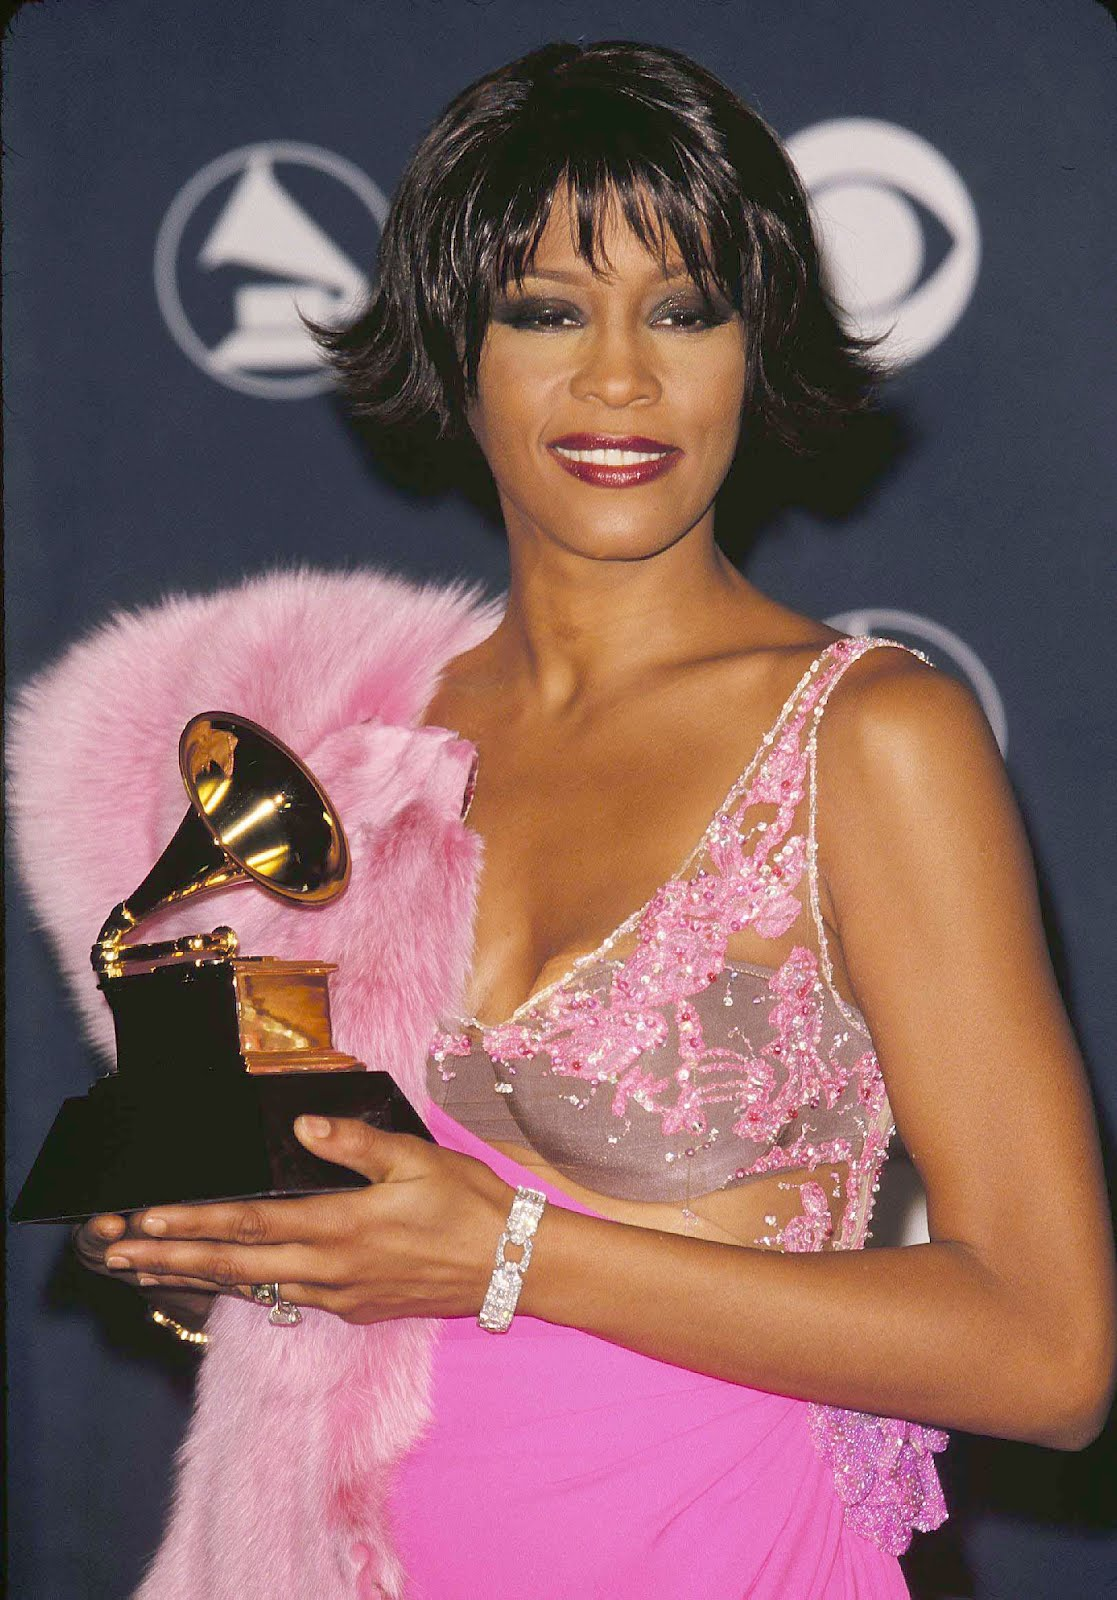 http://3.bp.blogspot.com/-l67kdKs7Eoc/Tz4JYd9BZcI/AAAAAAAAI5A/JFTOiCXi-Hs/s1600/Whitney_Grammys.jpg